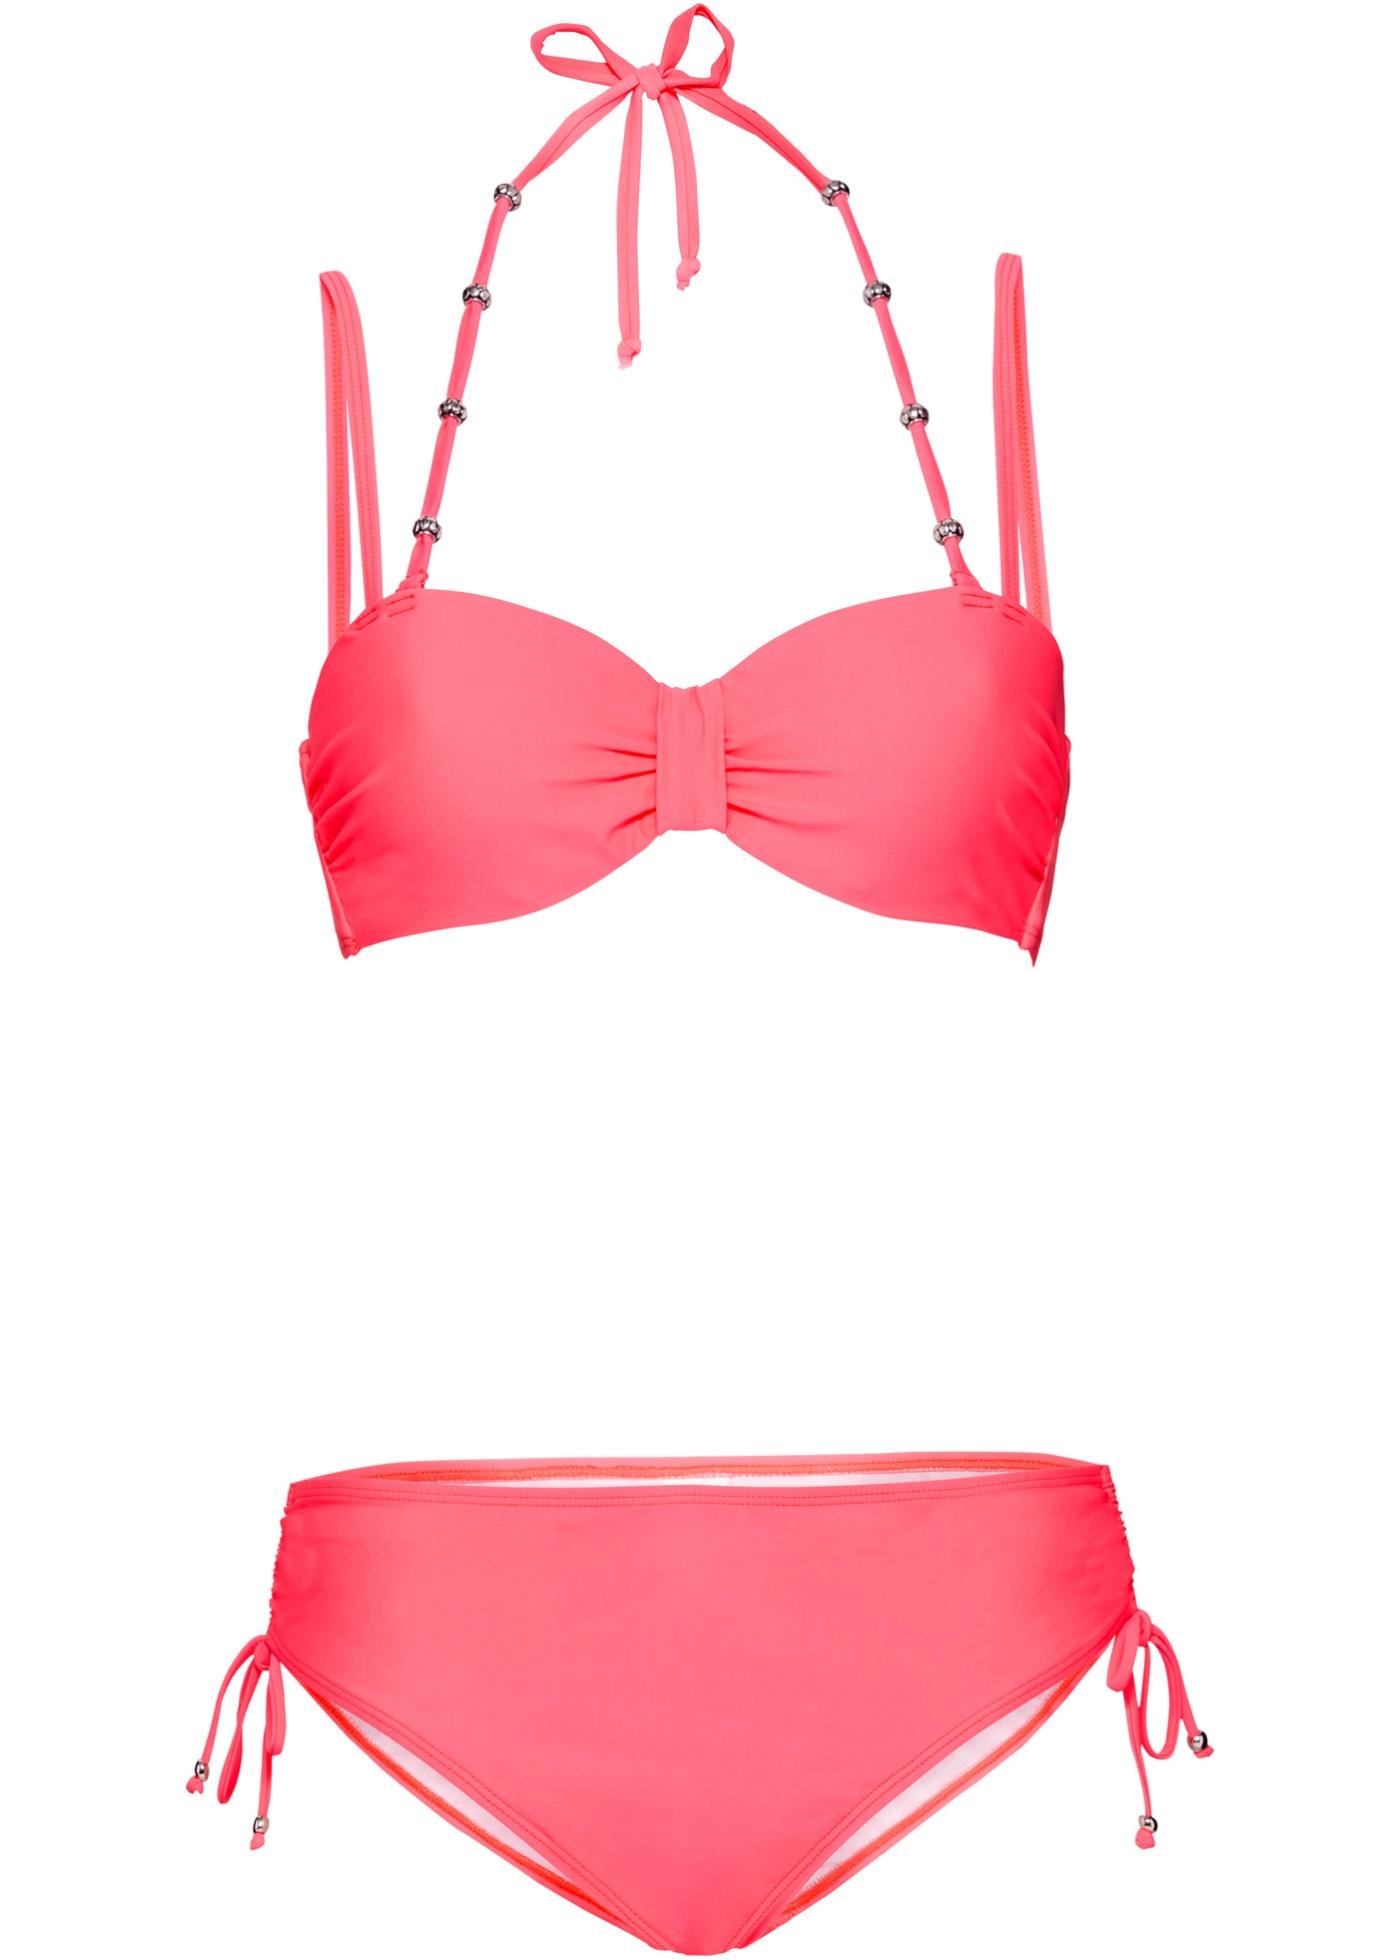 Bademode - Bügel Bikini (2 tlg. Set) › bonprix › rot  - Onlineshop Bonprix